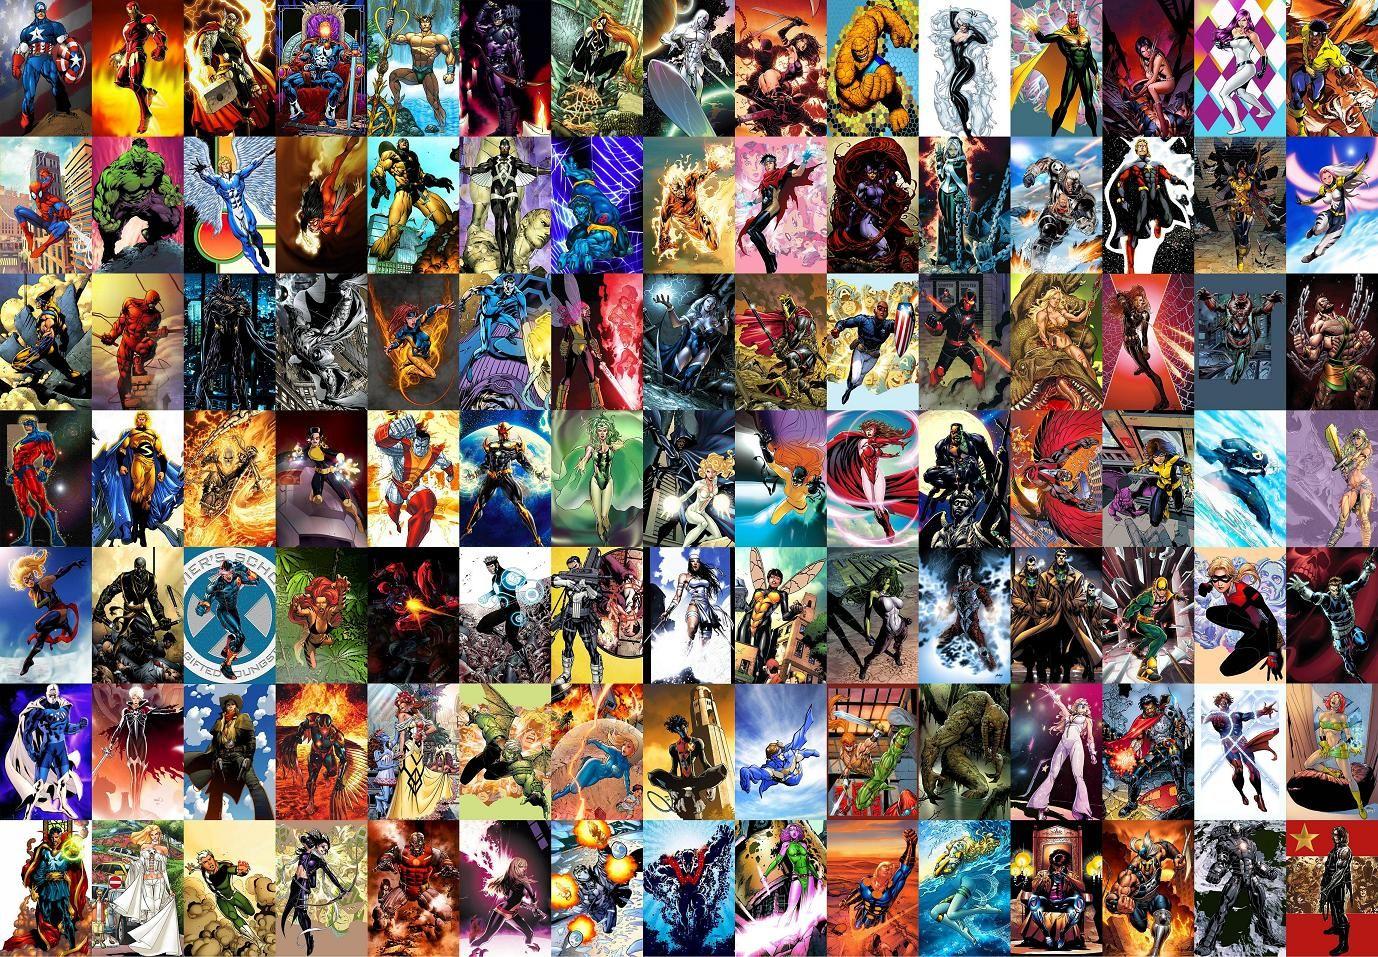 Dc superheroes wallpaper hd wallpapers pinterest wallpaper dc superheroes wallpaper marvel wallpaperhd voltagebd Gallery